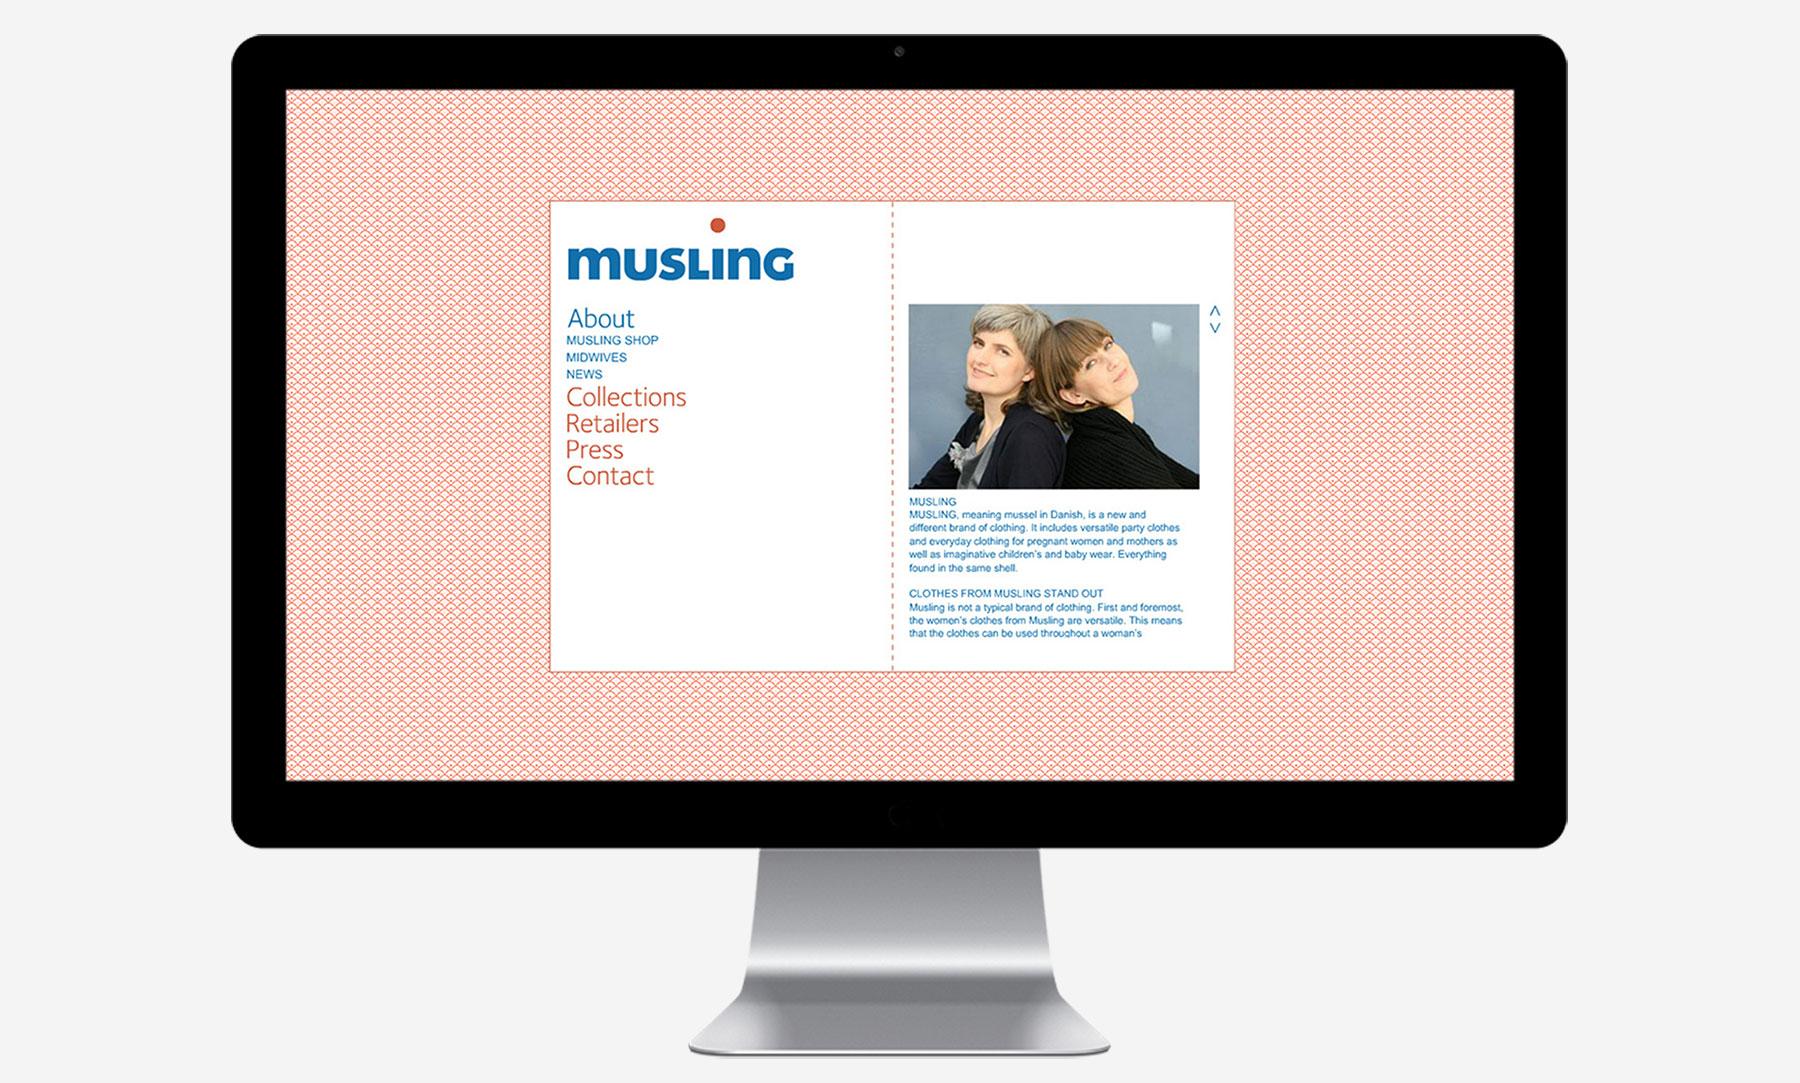 Musling: Desktop